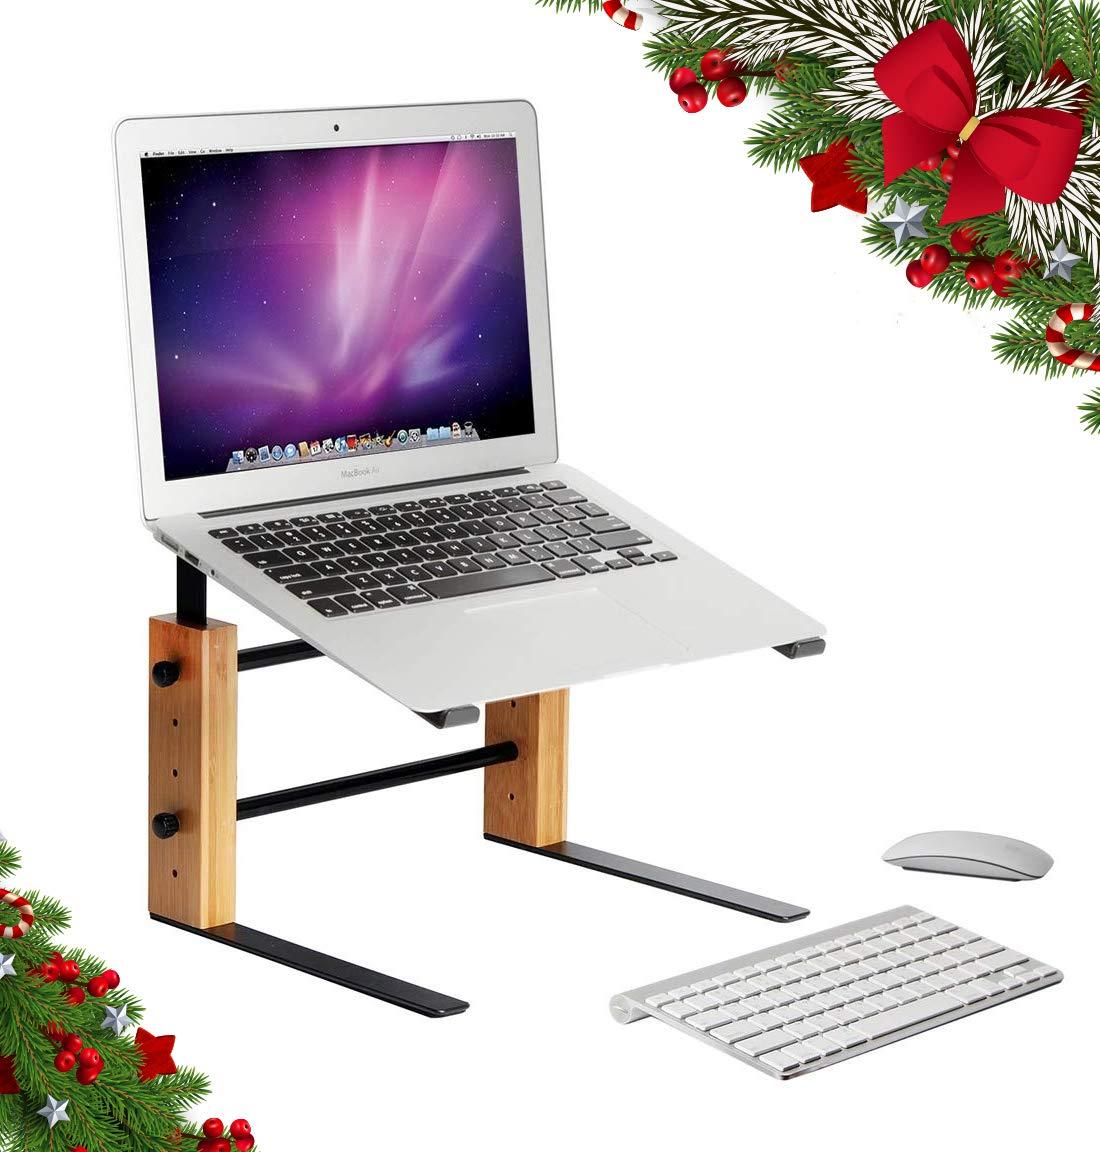 JackCubeDesign Laptop Computer Stand Adjustable Notebook Riser Holder Elevator Bamboo(11.41(Wide) x 9.44 inches) – :MK256A